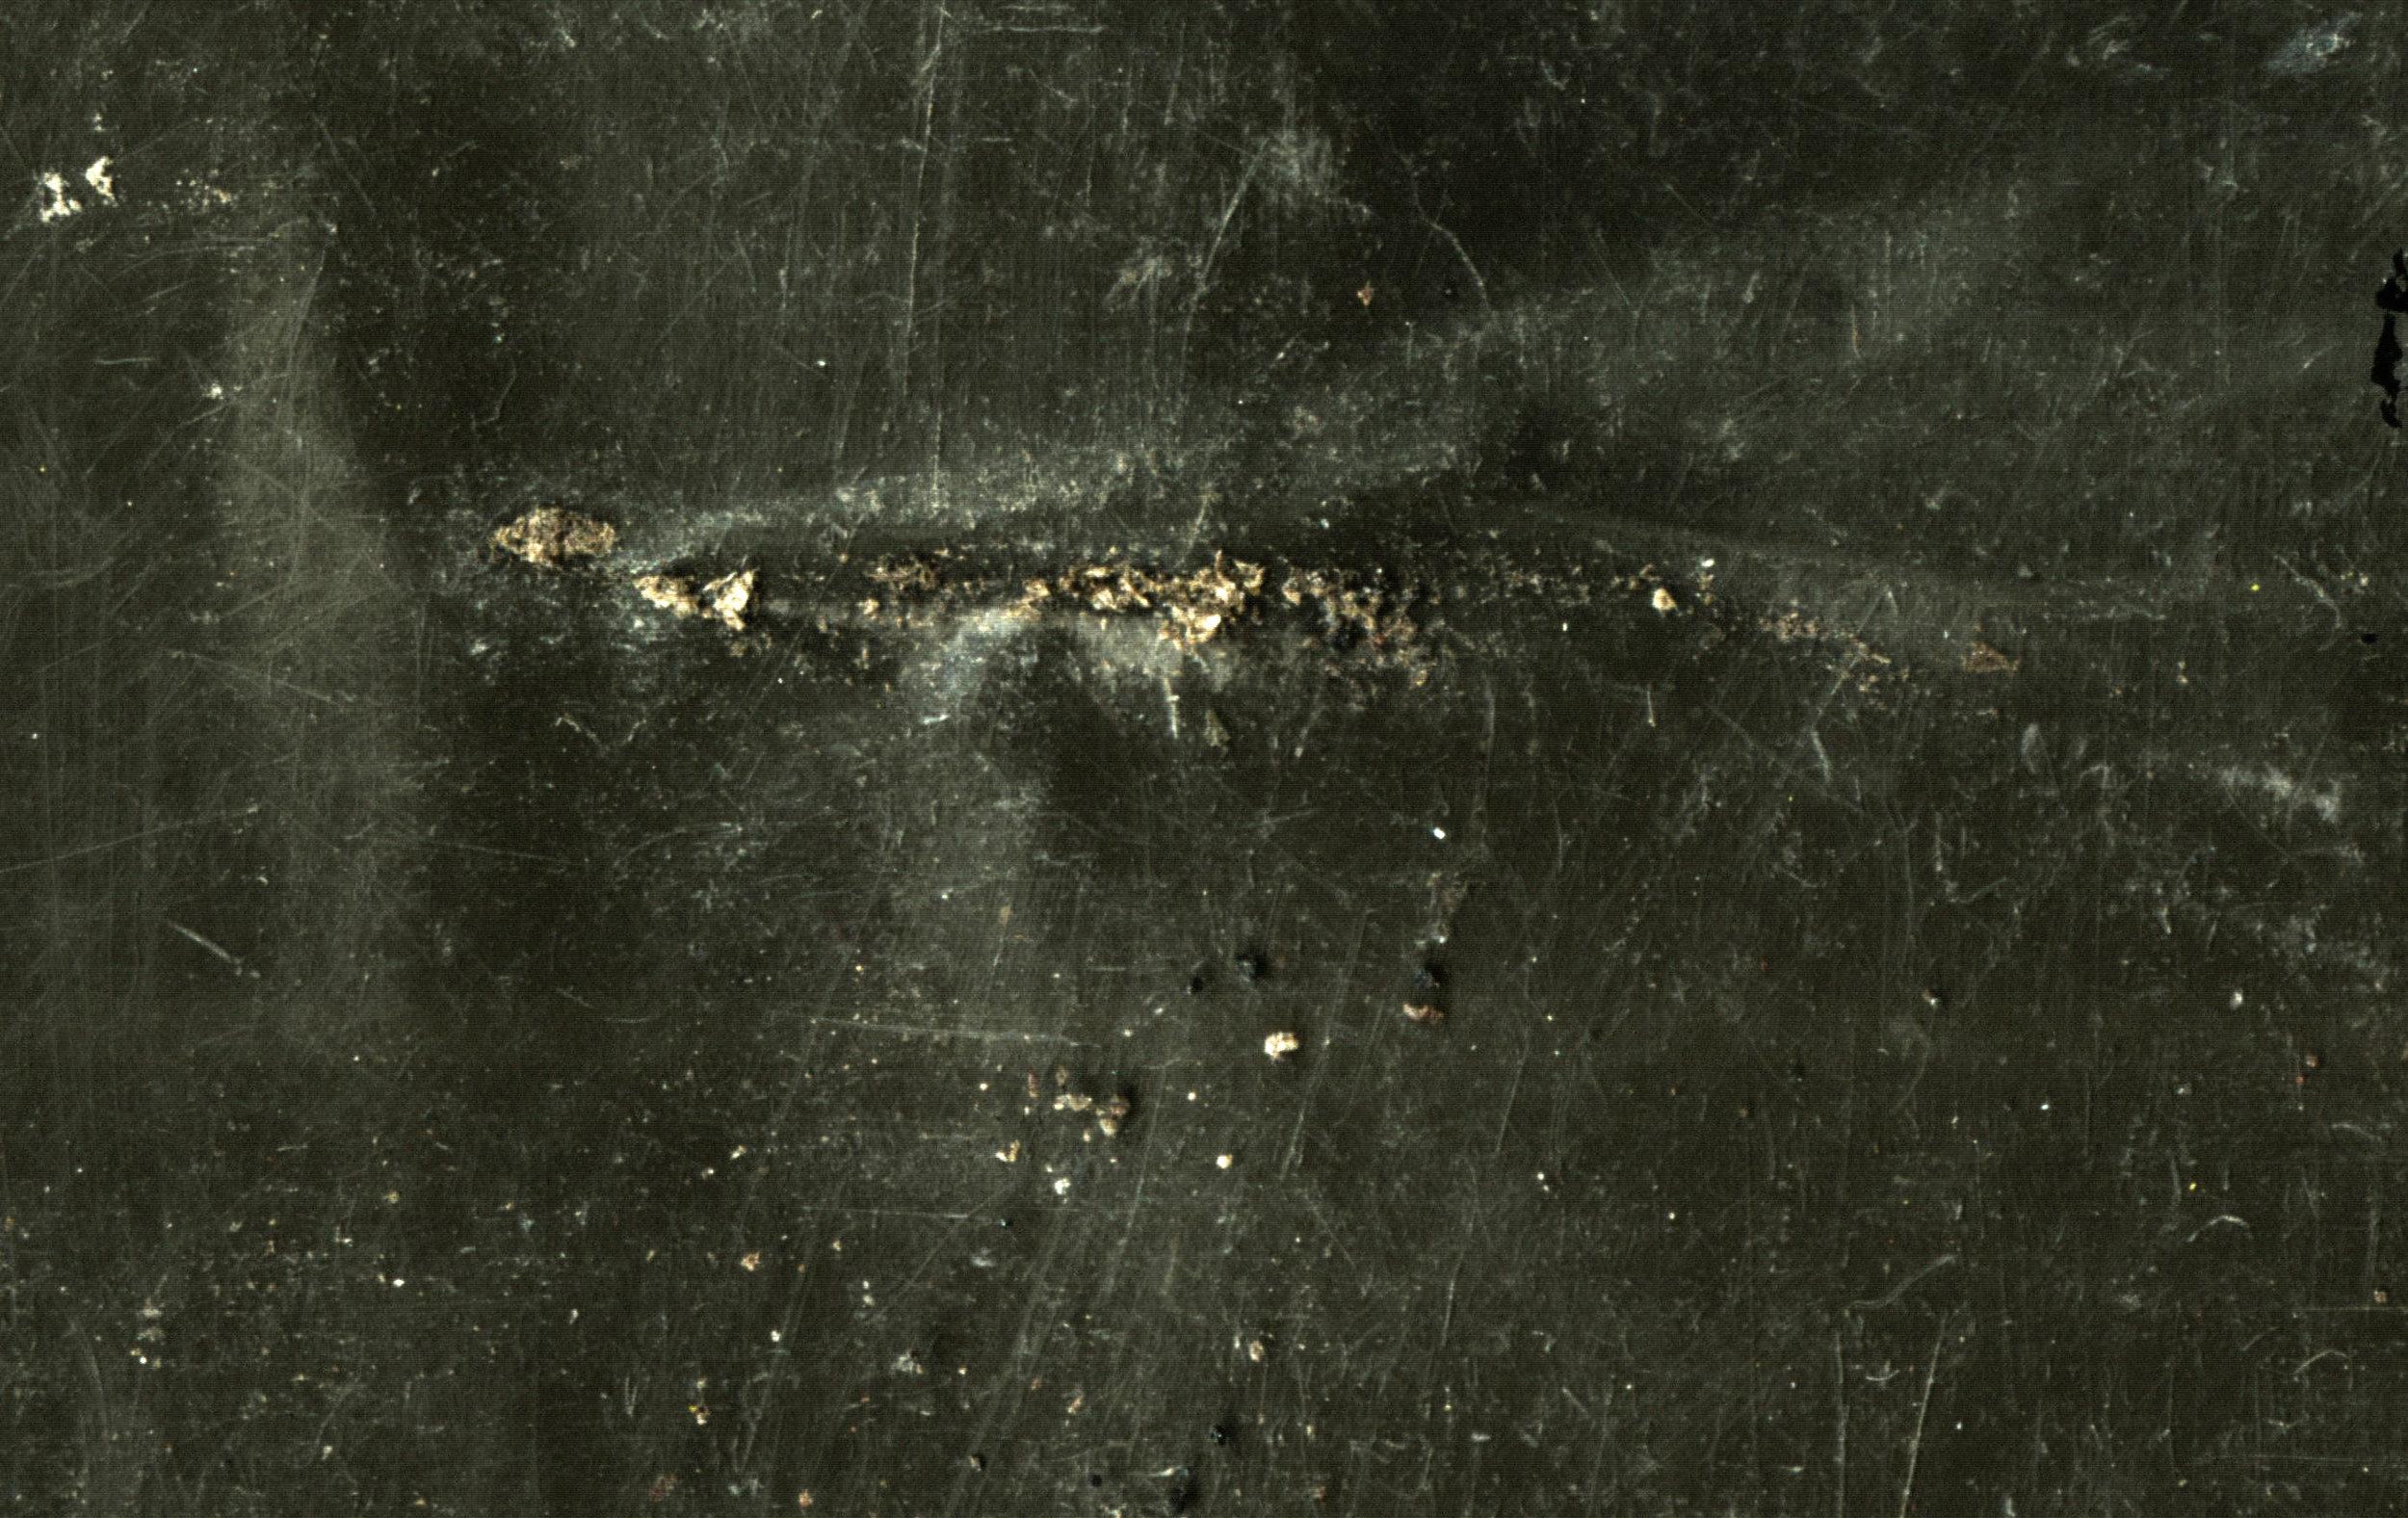 Krakatau Print 1.jpg